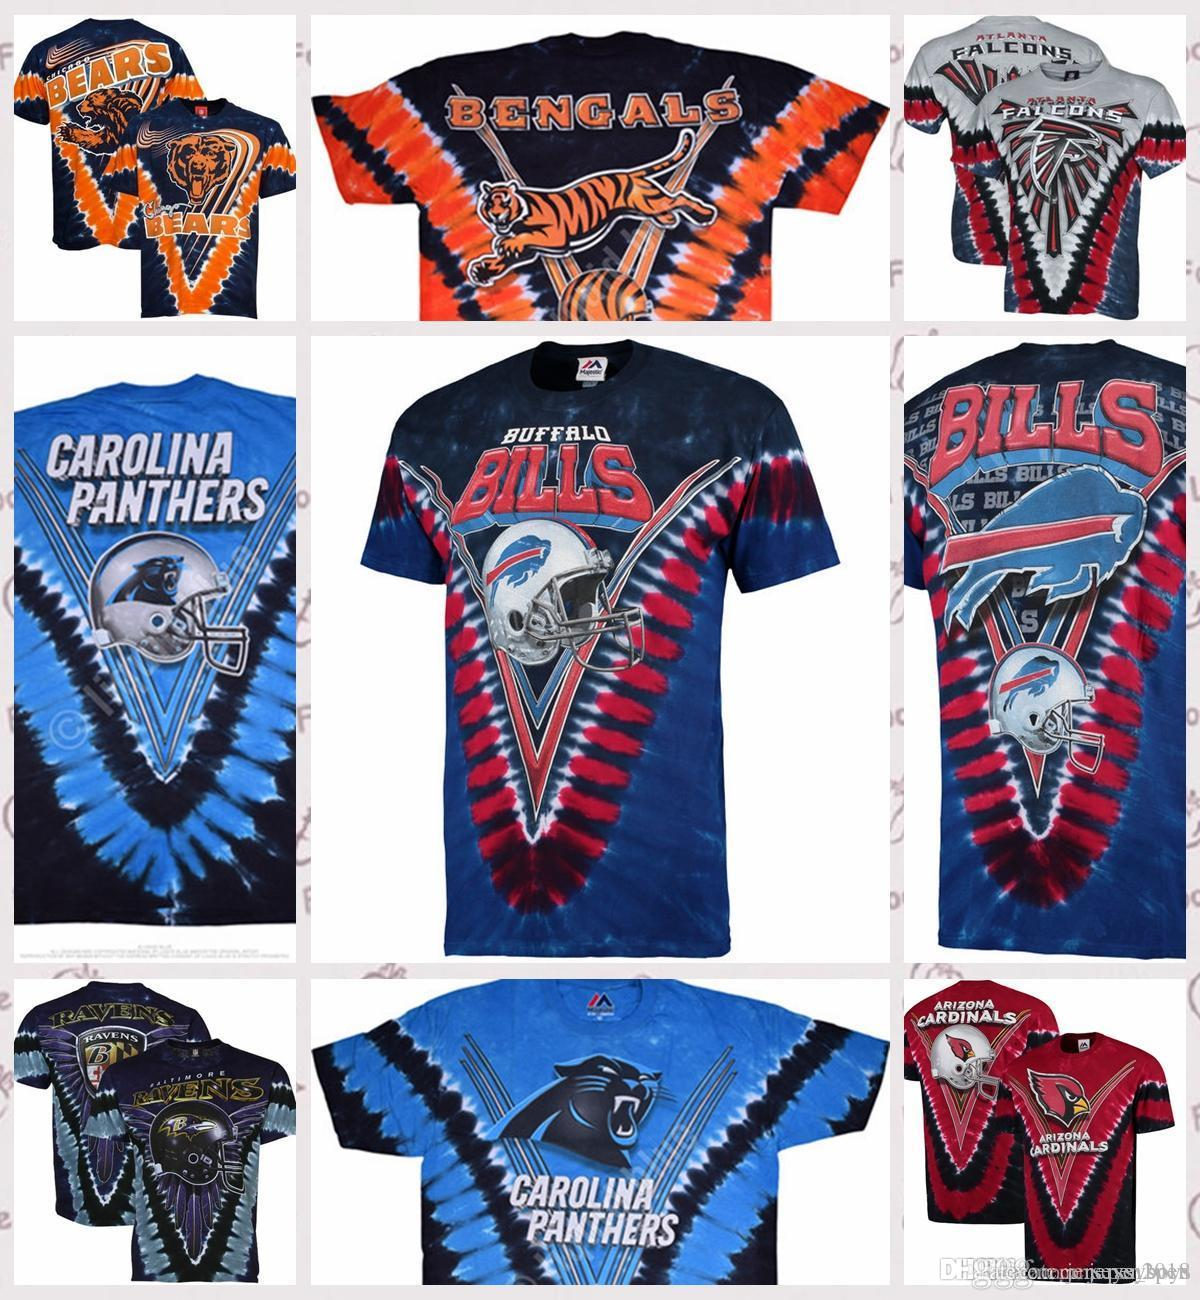 2019 Cincinnati Bengals Atlanta Falcons Chicago Bears Carolina Panthers  Buffalo Bills Majestic Baltimore Ravens Atlanta Falcons Tie Dye T Shirt  From ... b3d4bfb6a